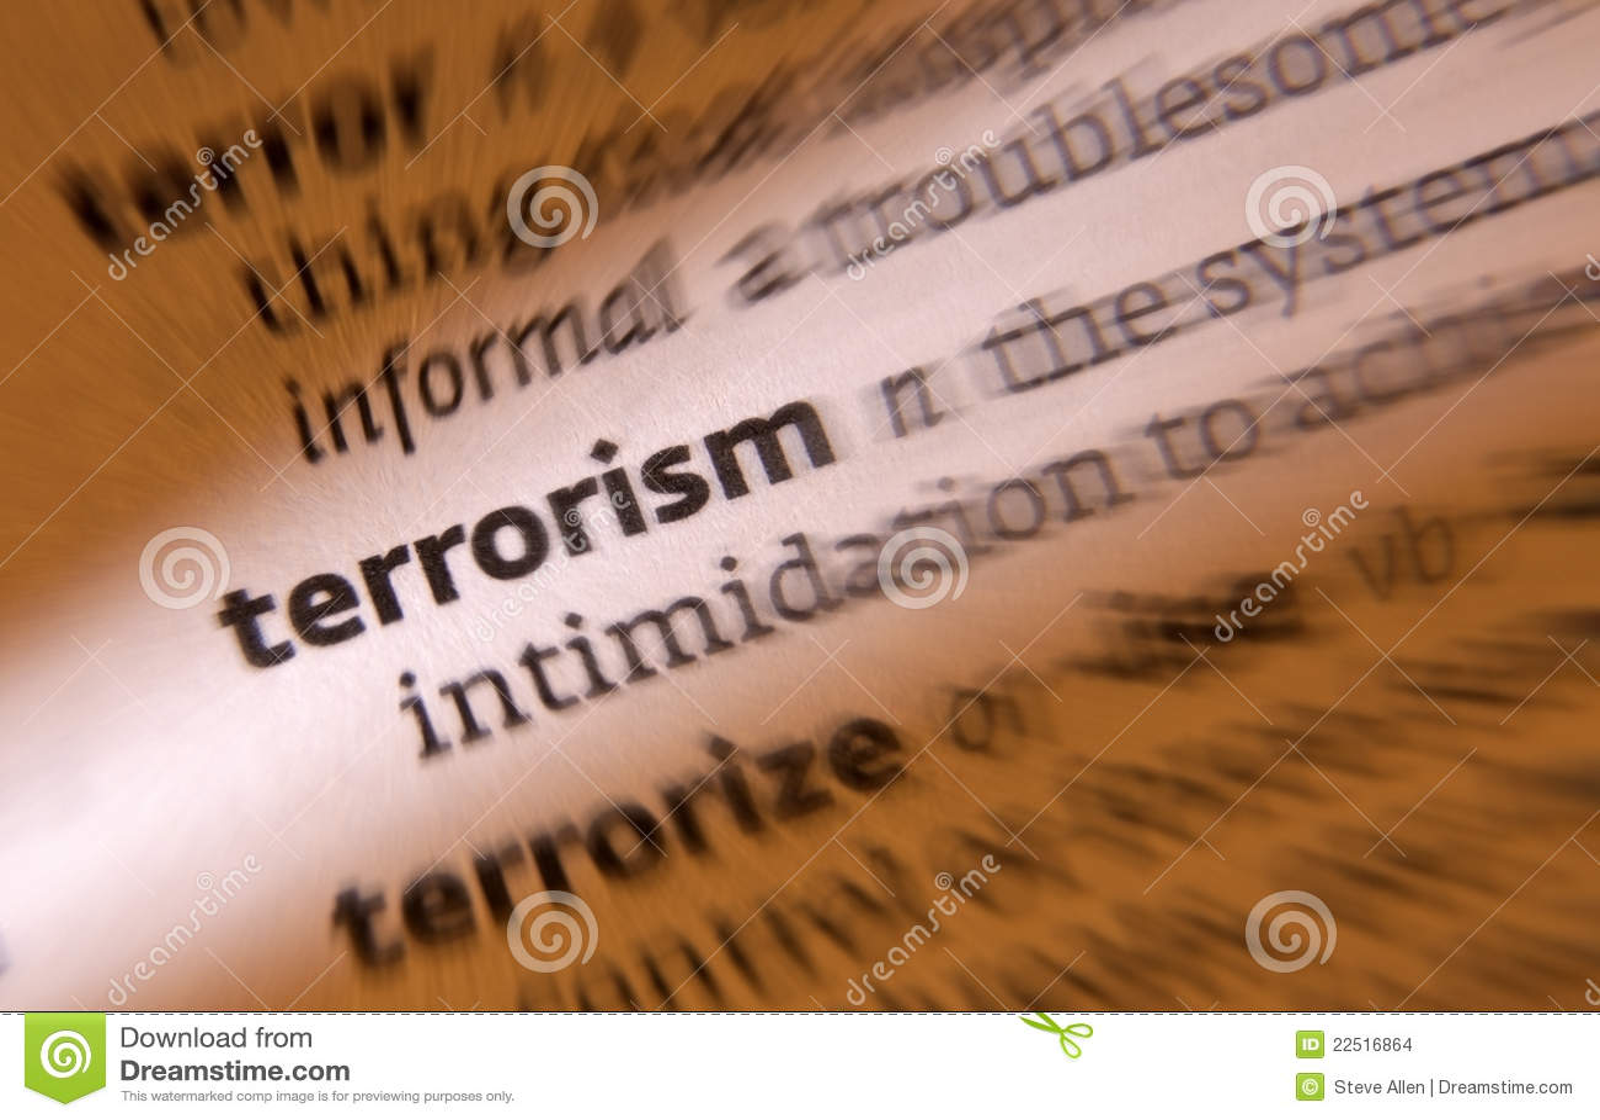 Террорисм - террорист